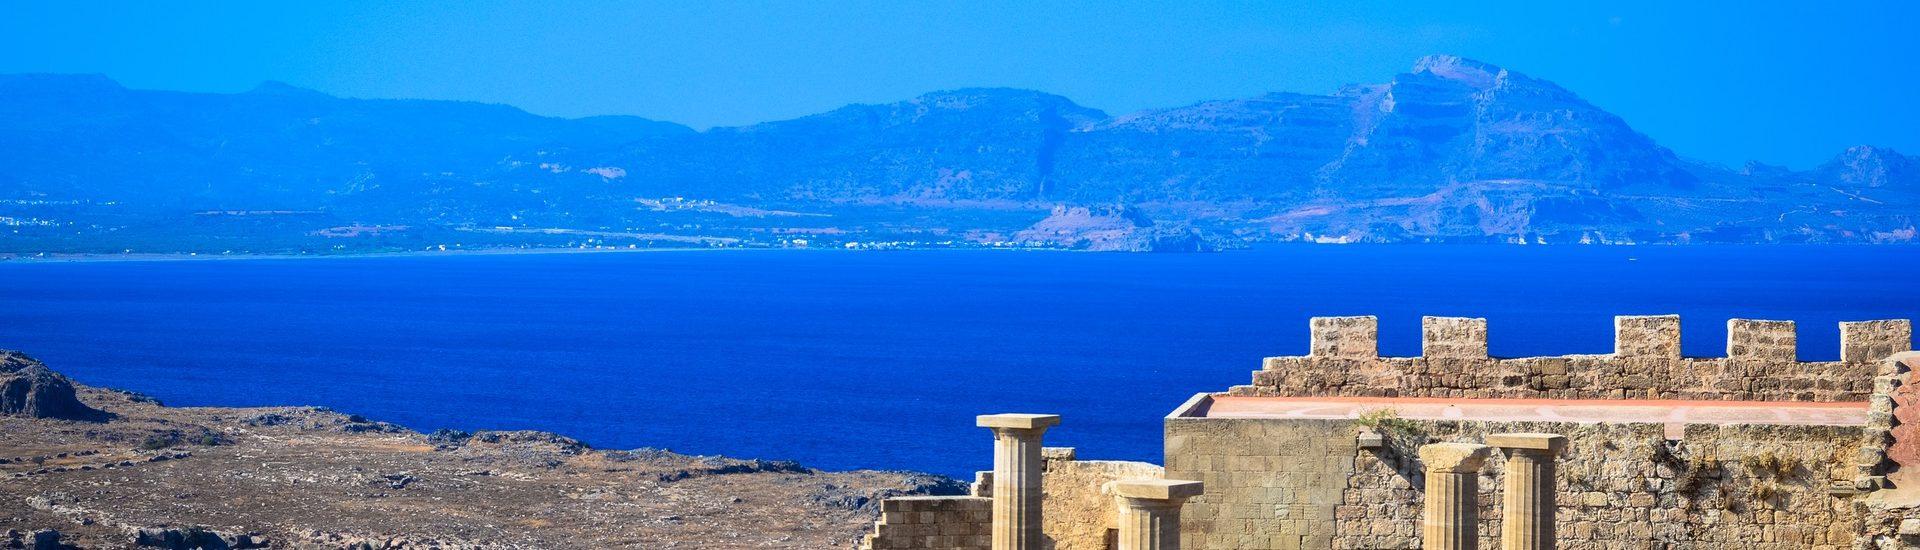 ruins mac 1920x550 - The Magic of Morocco: Tips for European Travelers